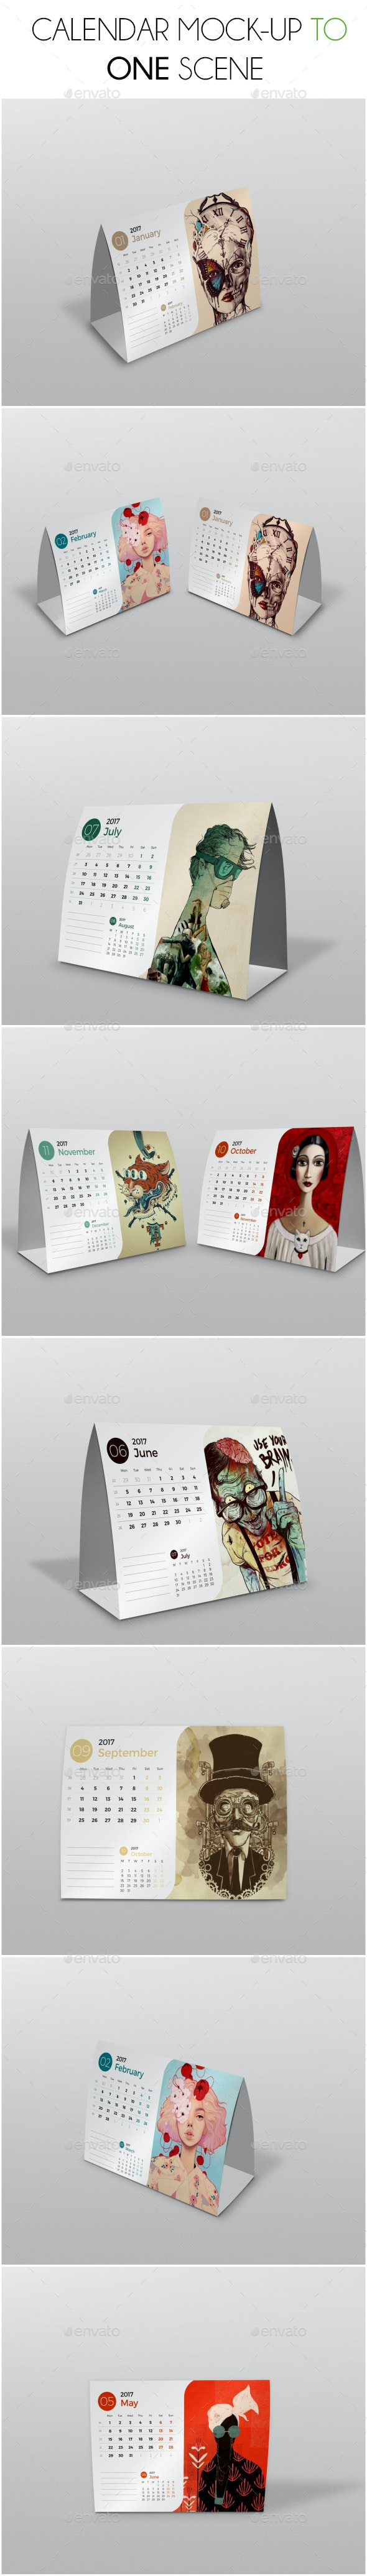 Calendar Mockup Scene - Product Mock-Ups Graphics